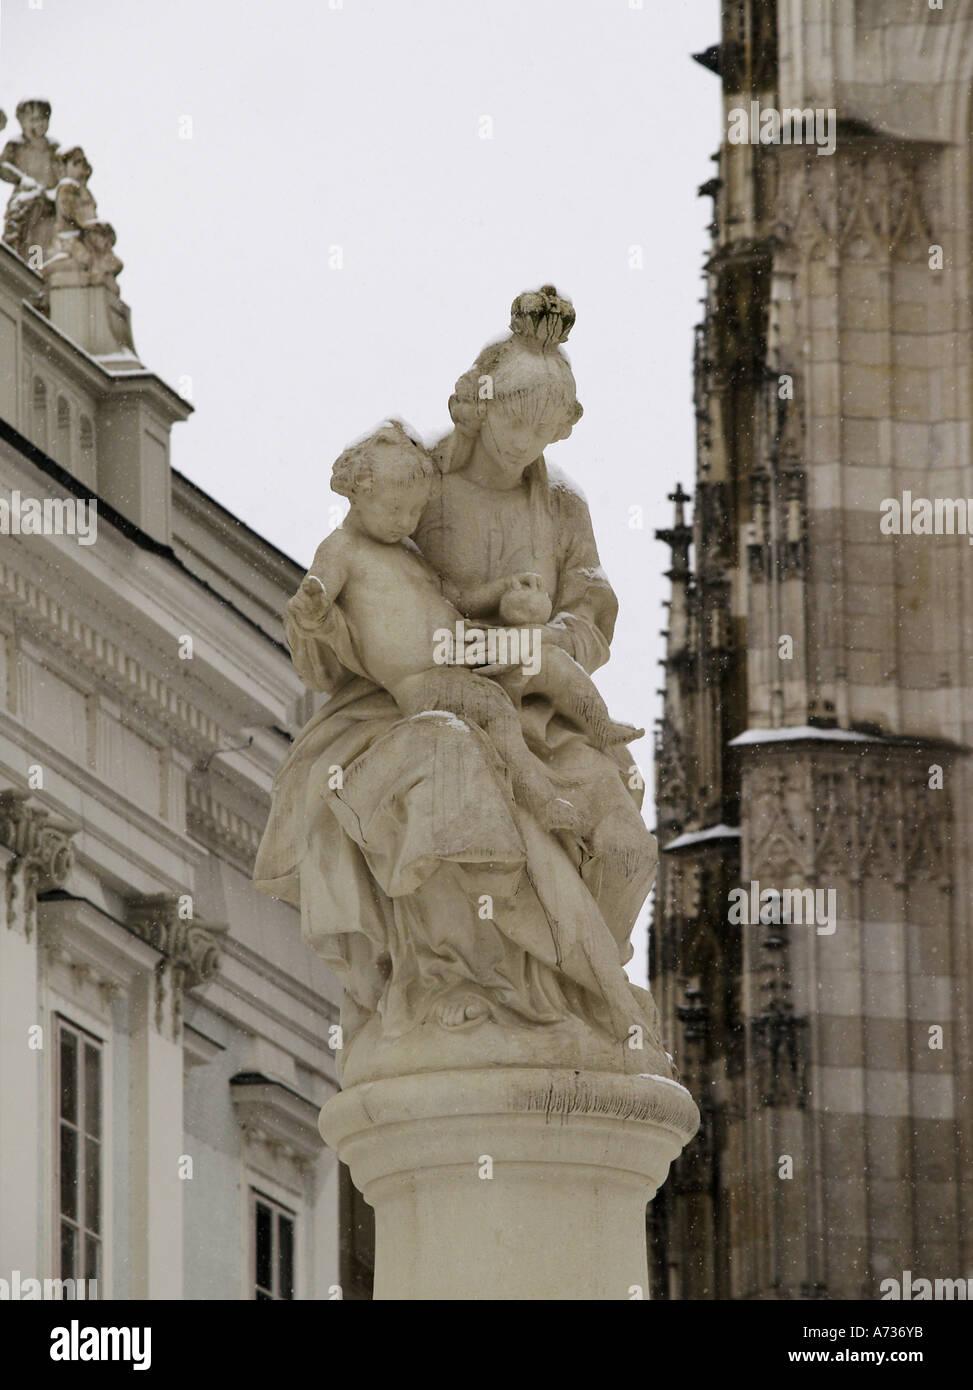 Passau, city view statue of Virgin Mary and Jesus Stock Photo